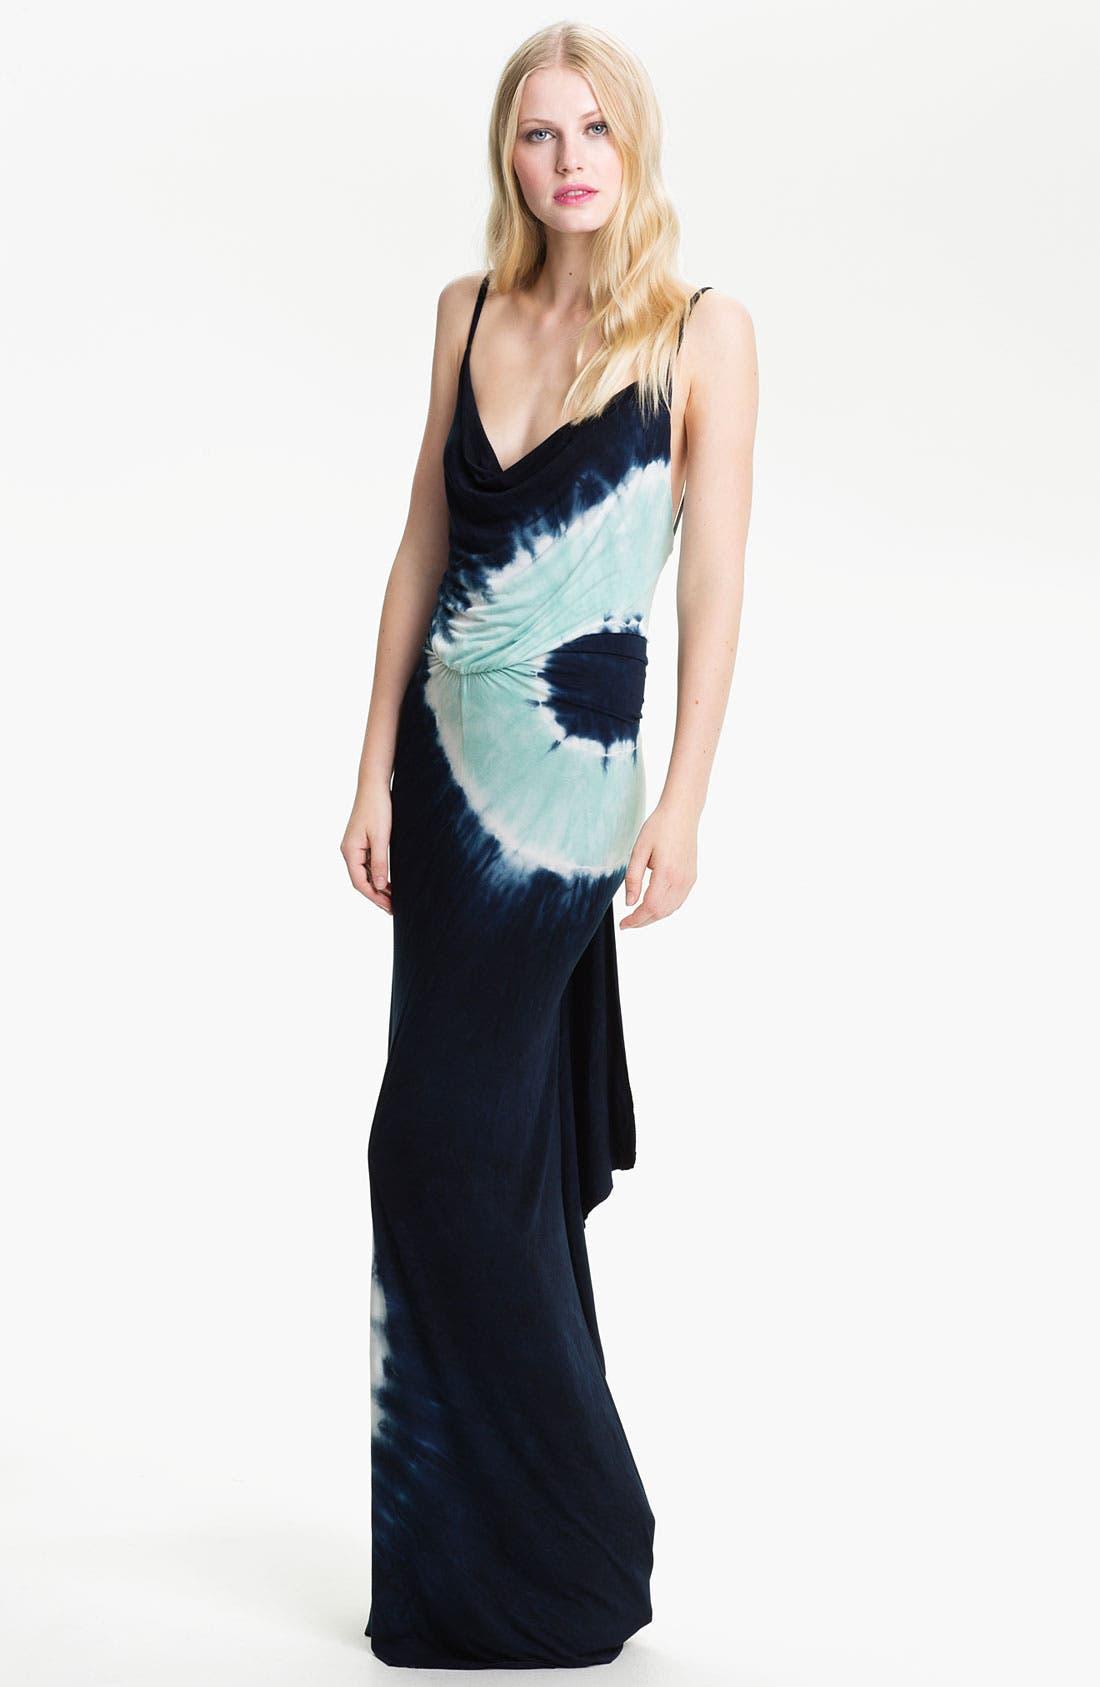 Alternate Image 1 Selected - Young, Fabulous & Broke 'Lavinia' Tie Dye Maxi Dress